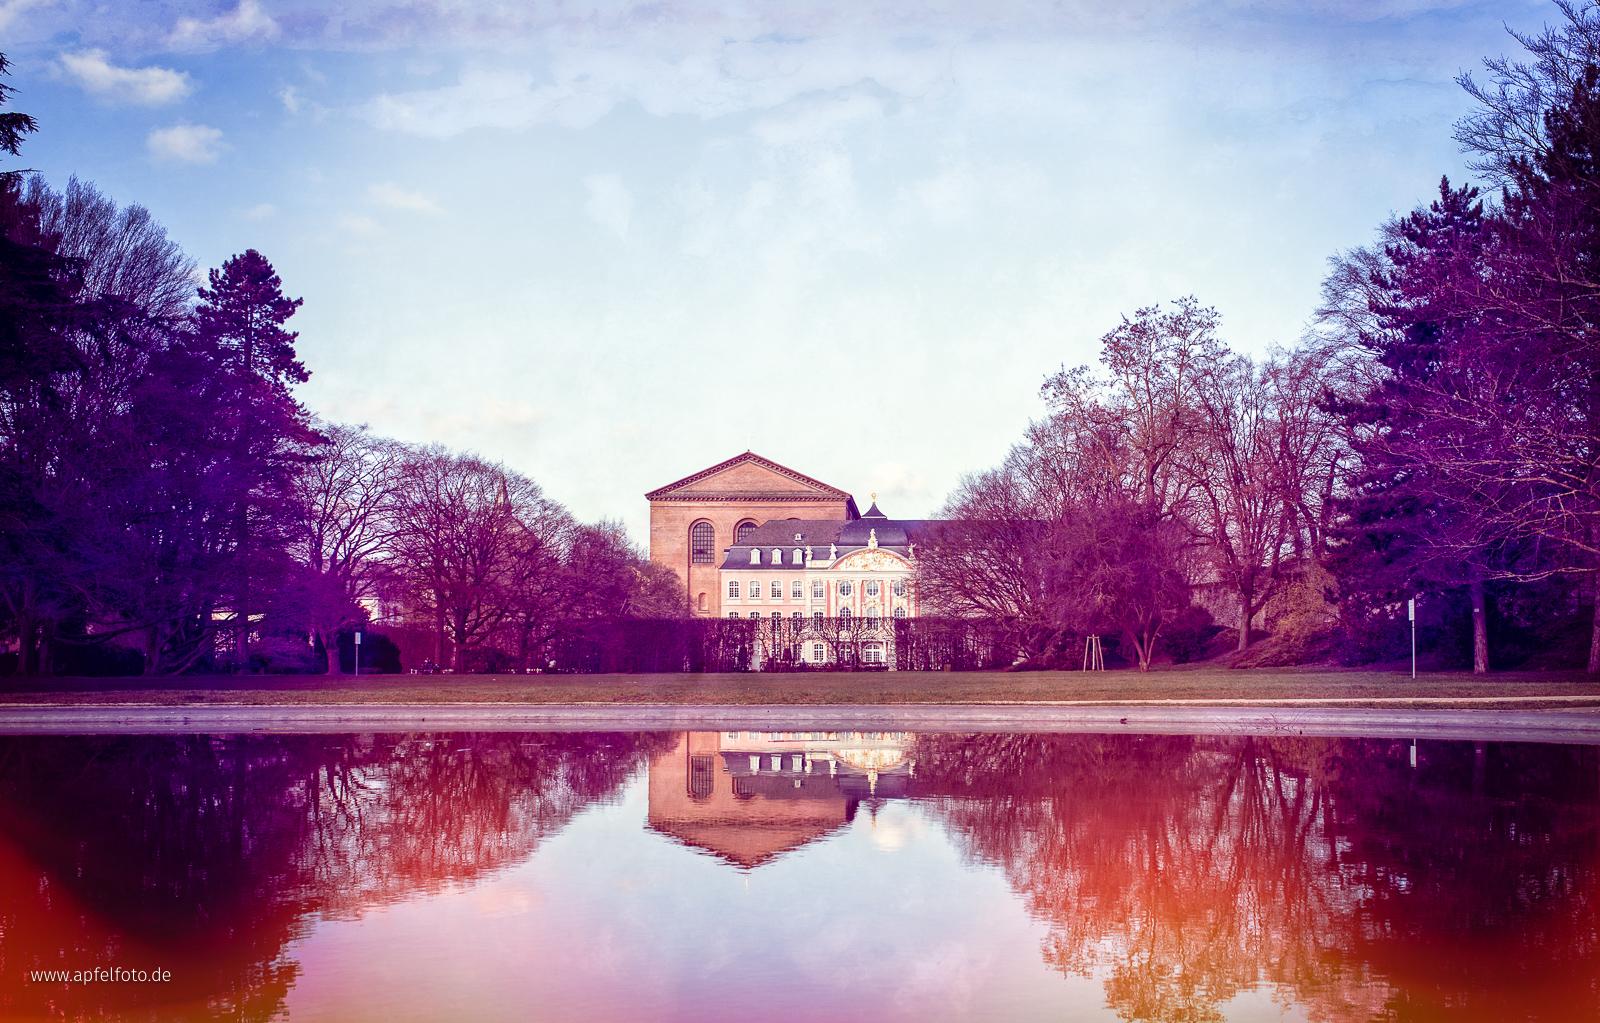 Palace, Trier